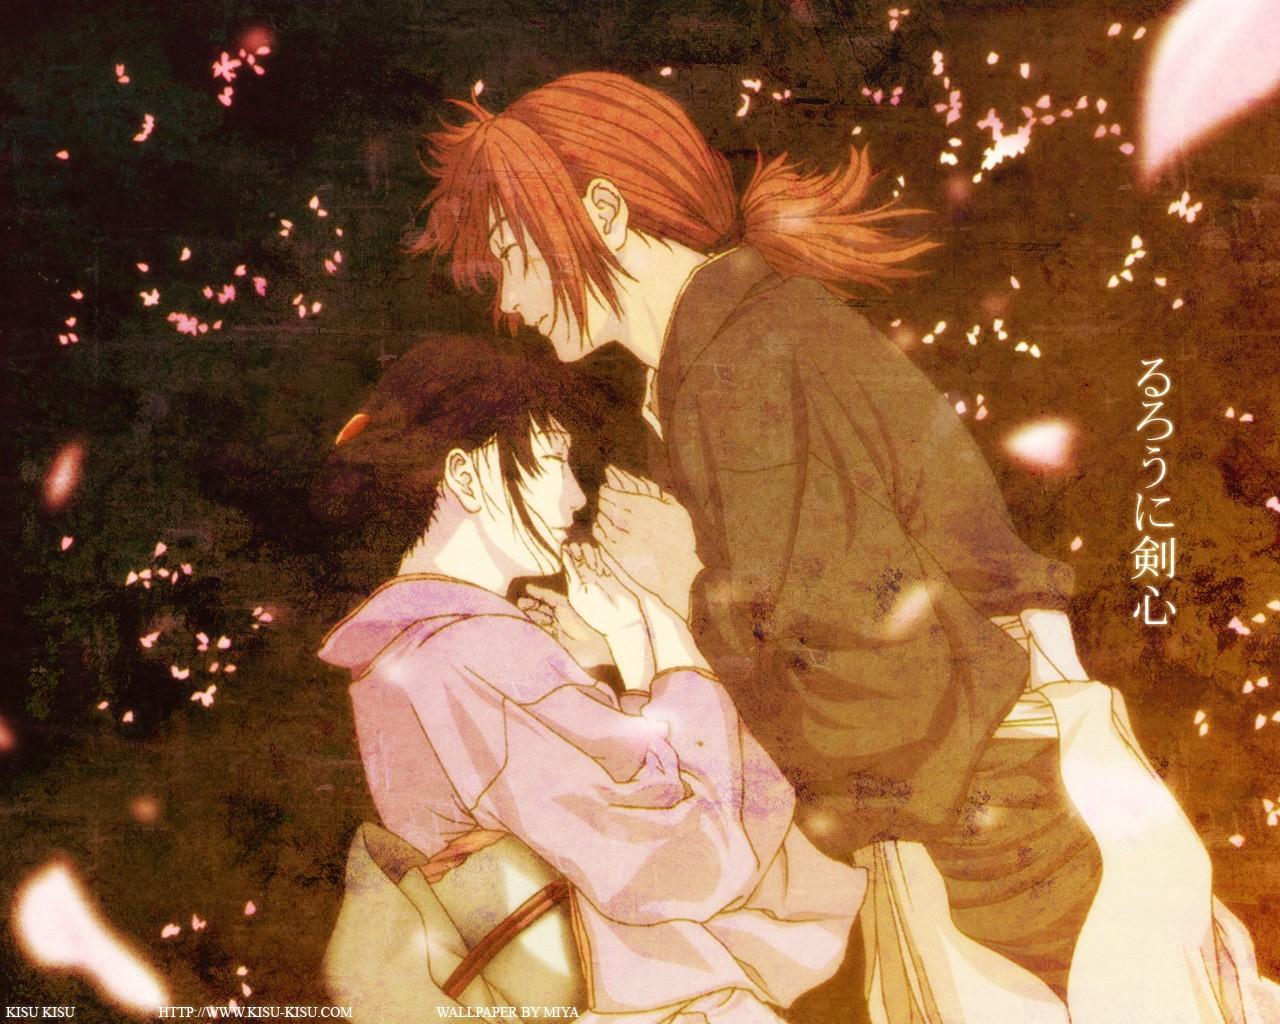 Wallpaper Anime Christmas Samurai X Romance Interaction